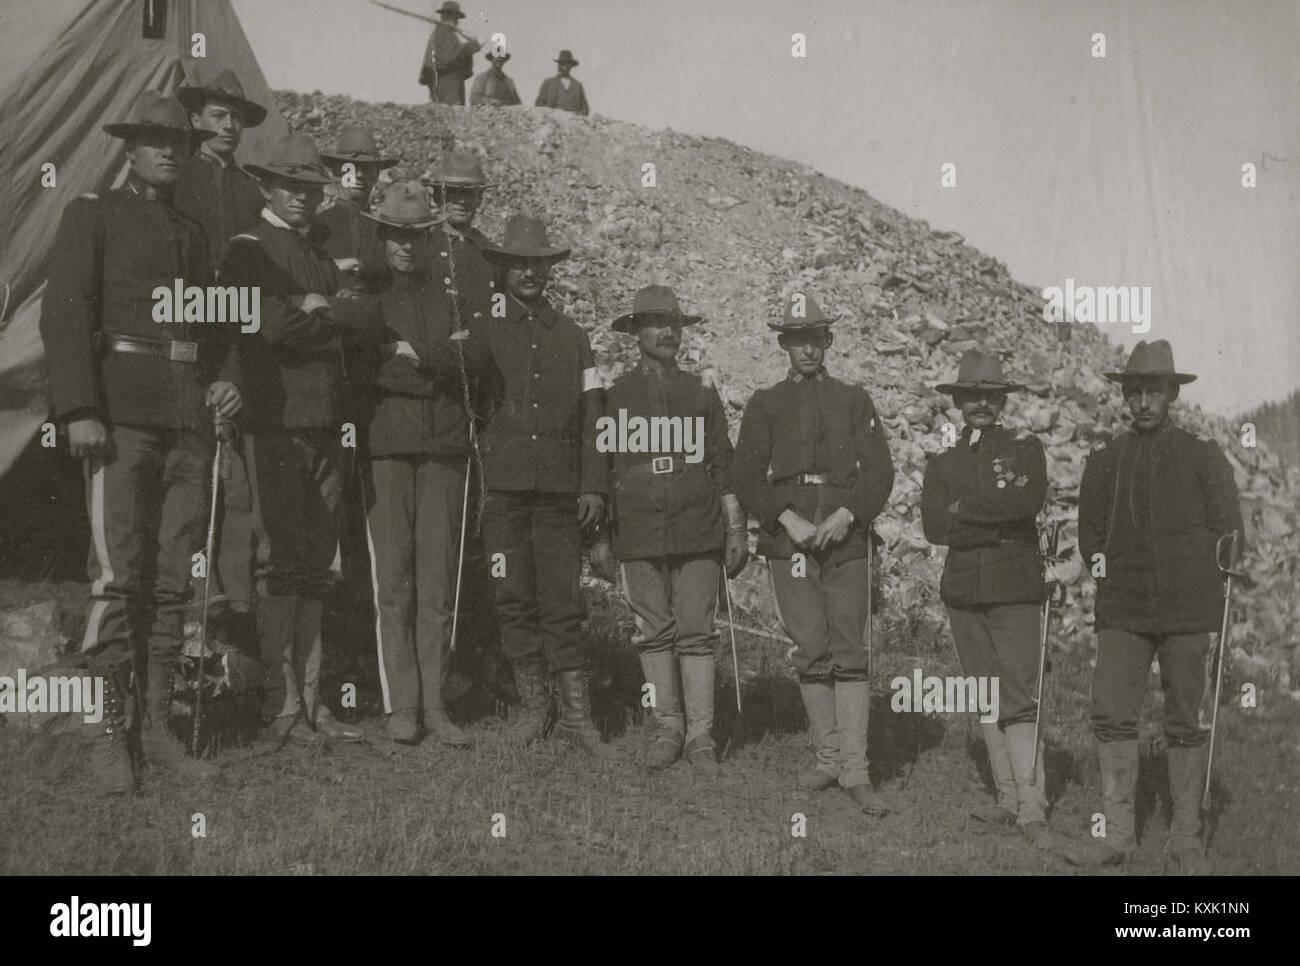 Militia At Cripple Creek, Colorado 1903 - Stock Image